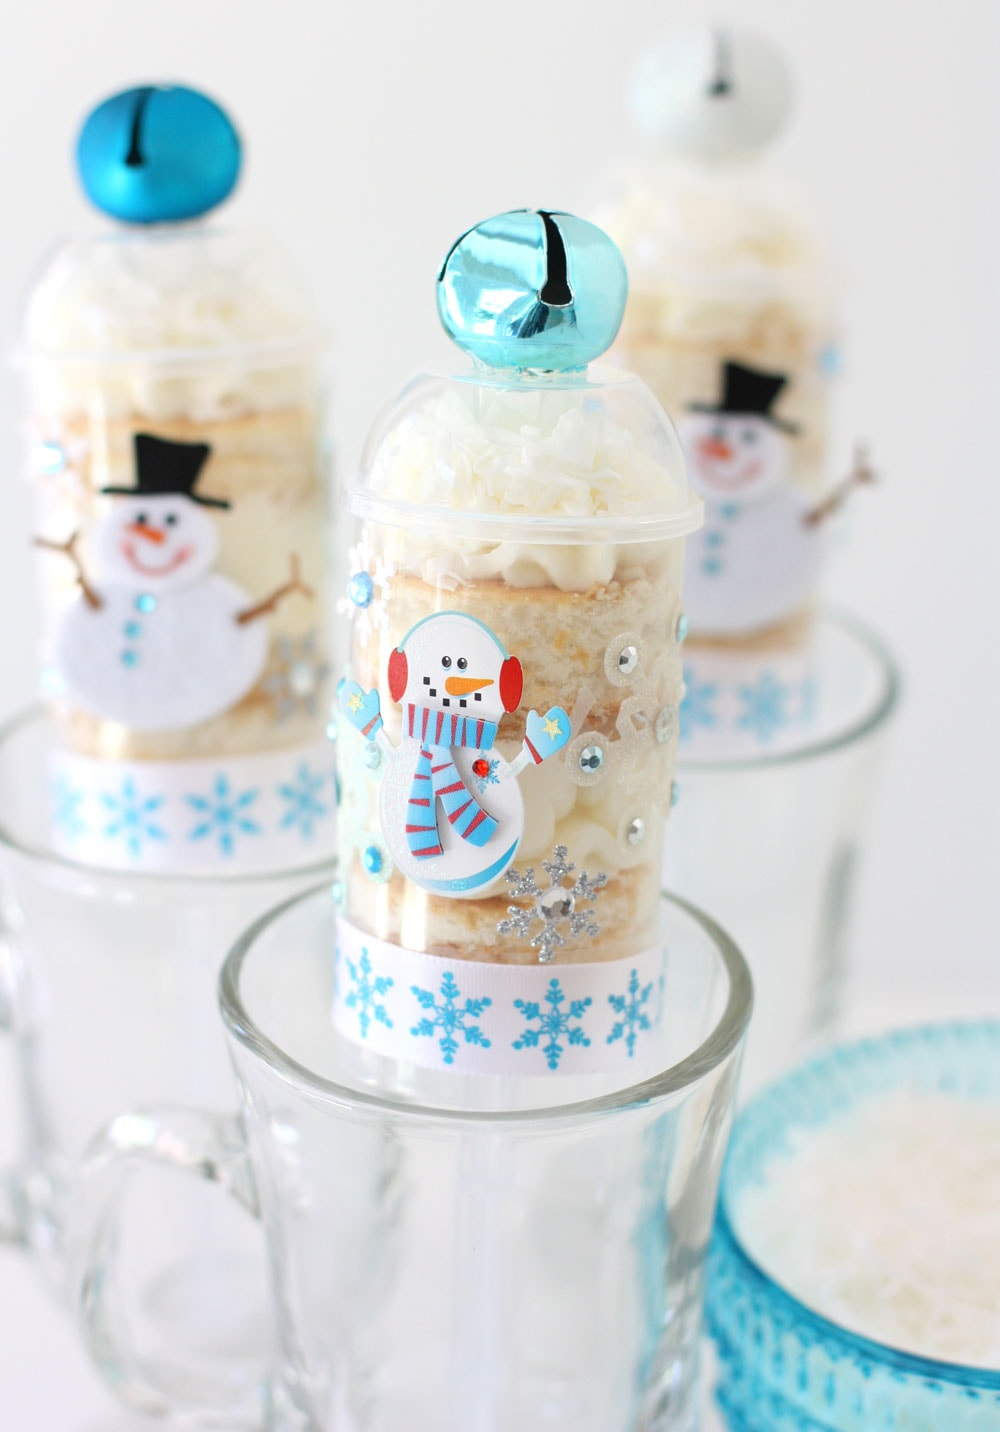 Snowman Cake Push-Up Pops!